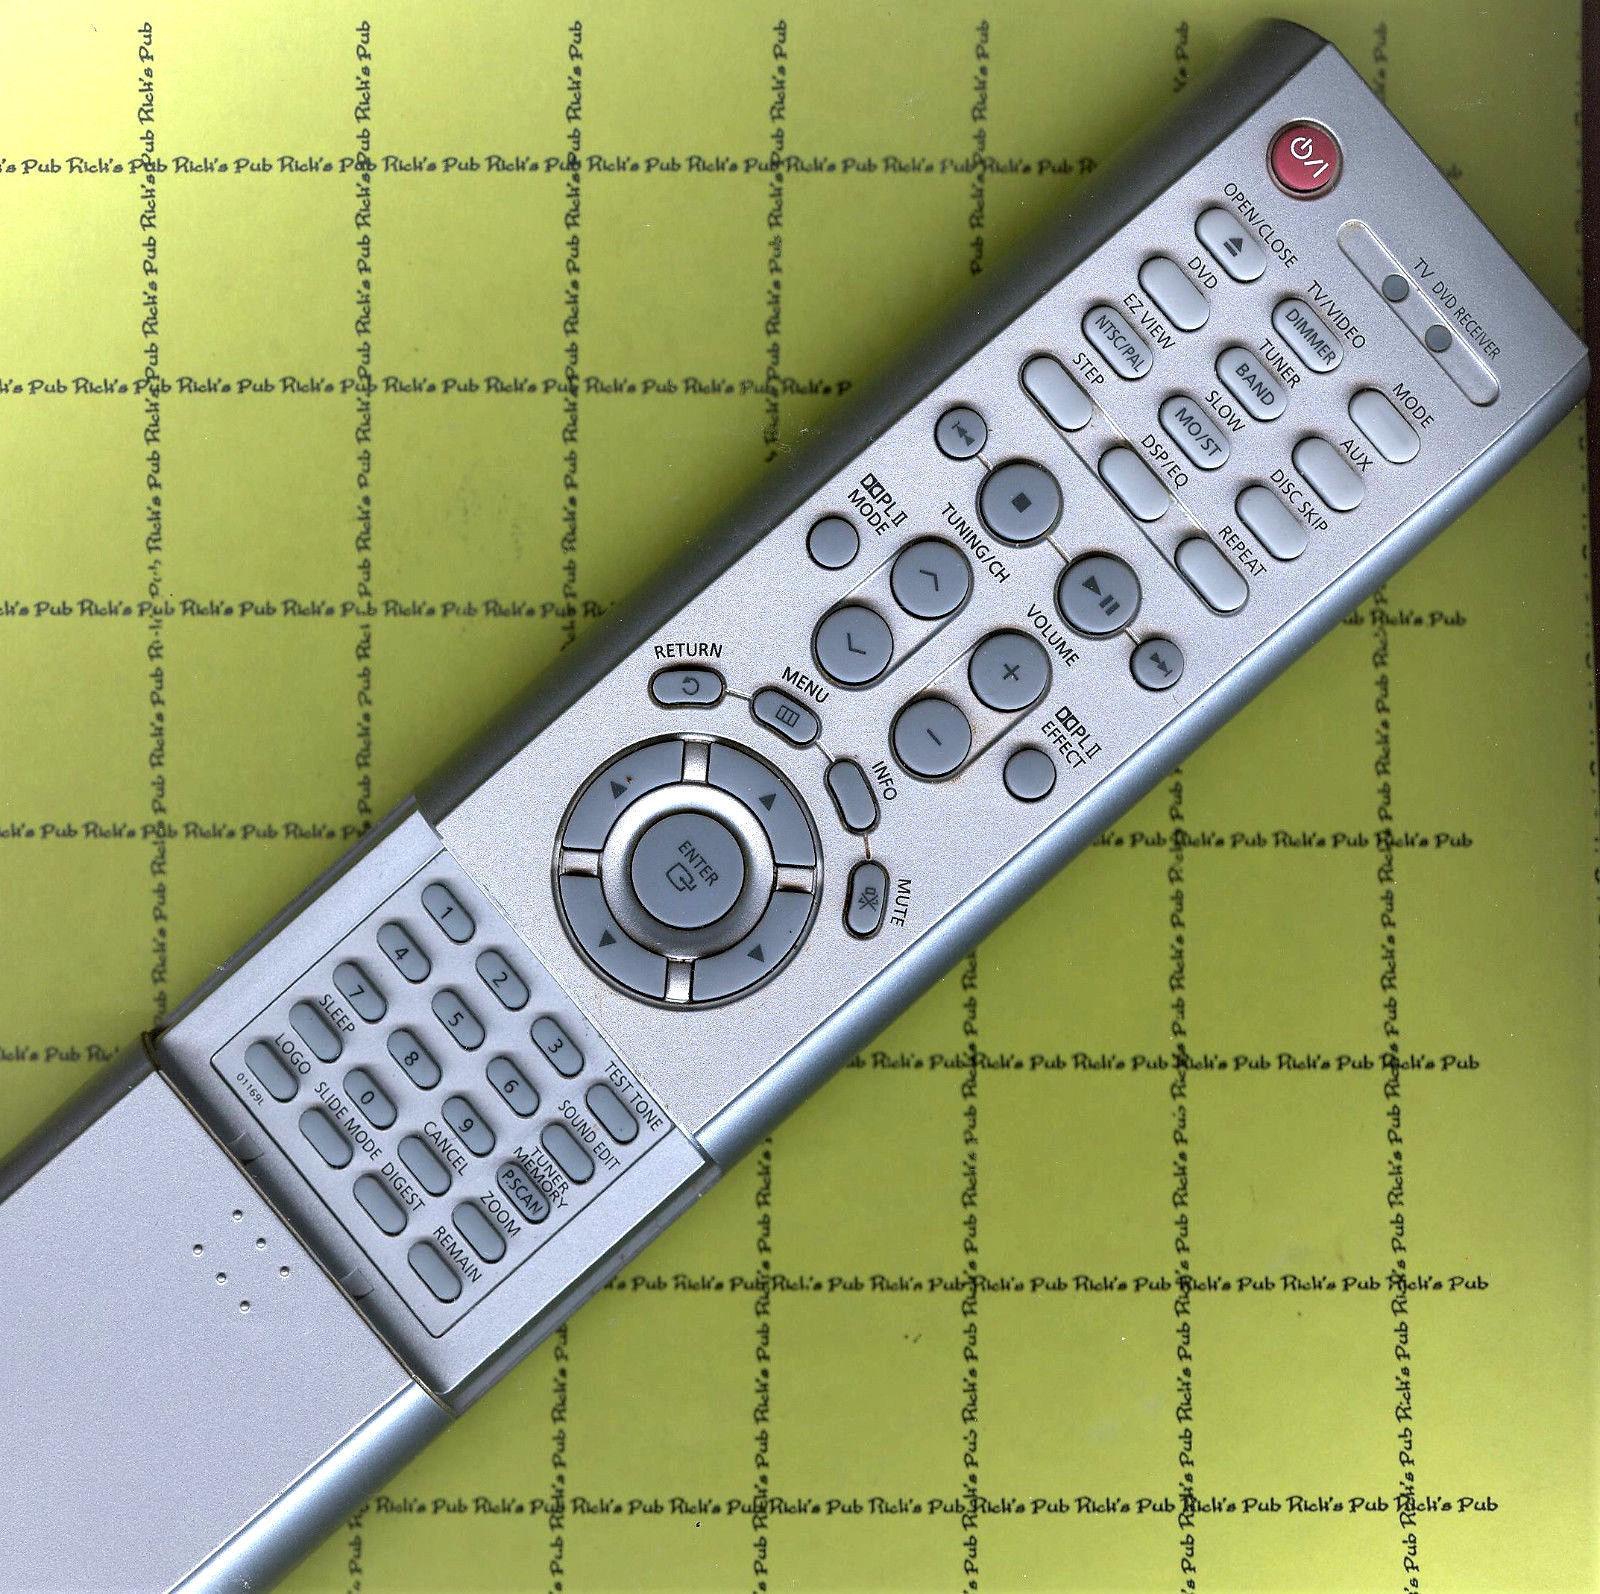 samsung ht db600 dvd receiver service manual